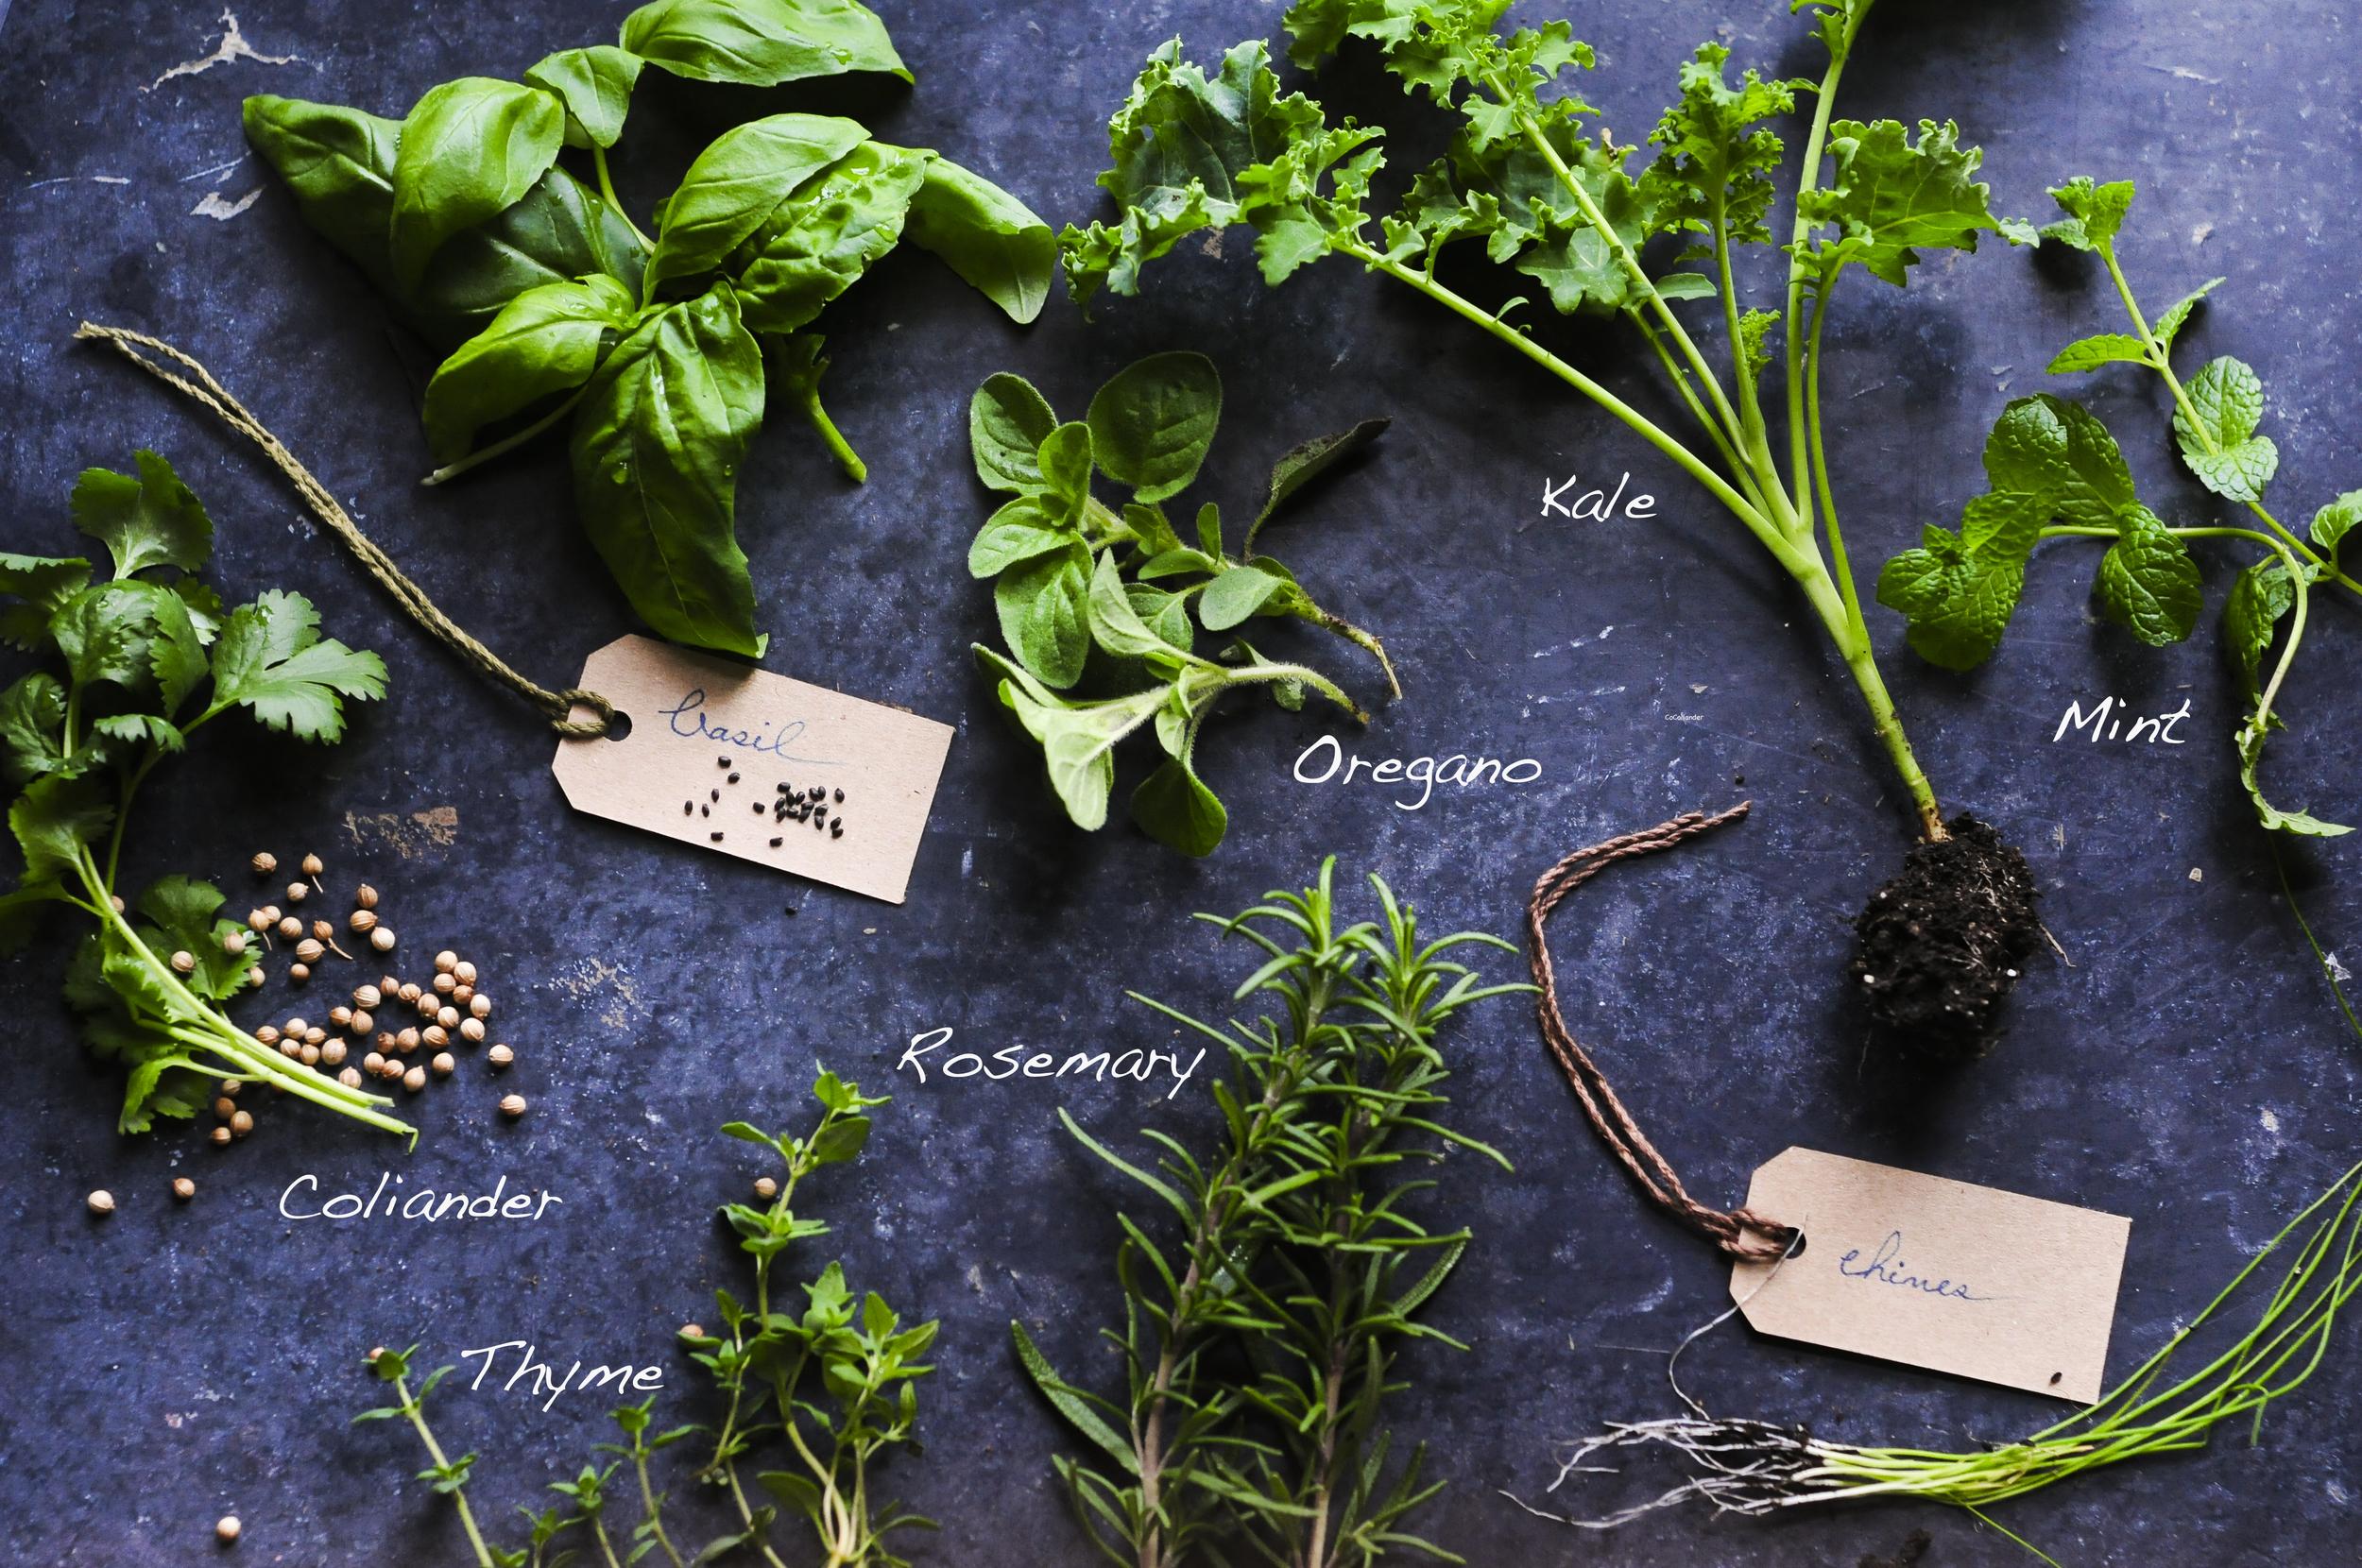 a.big.name.herbs.green.kale.basil.oregano.chives.coliander.DSC_6869.jpg